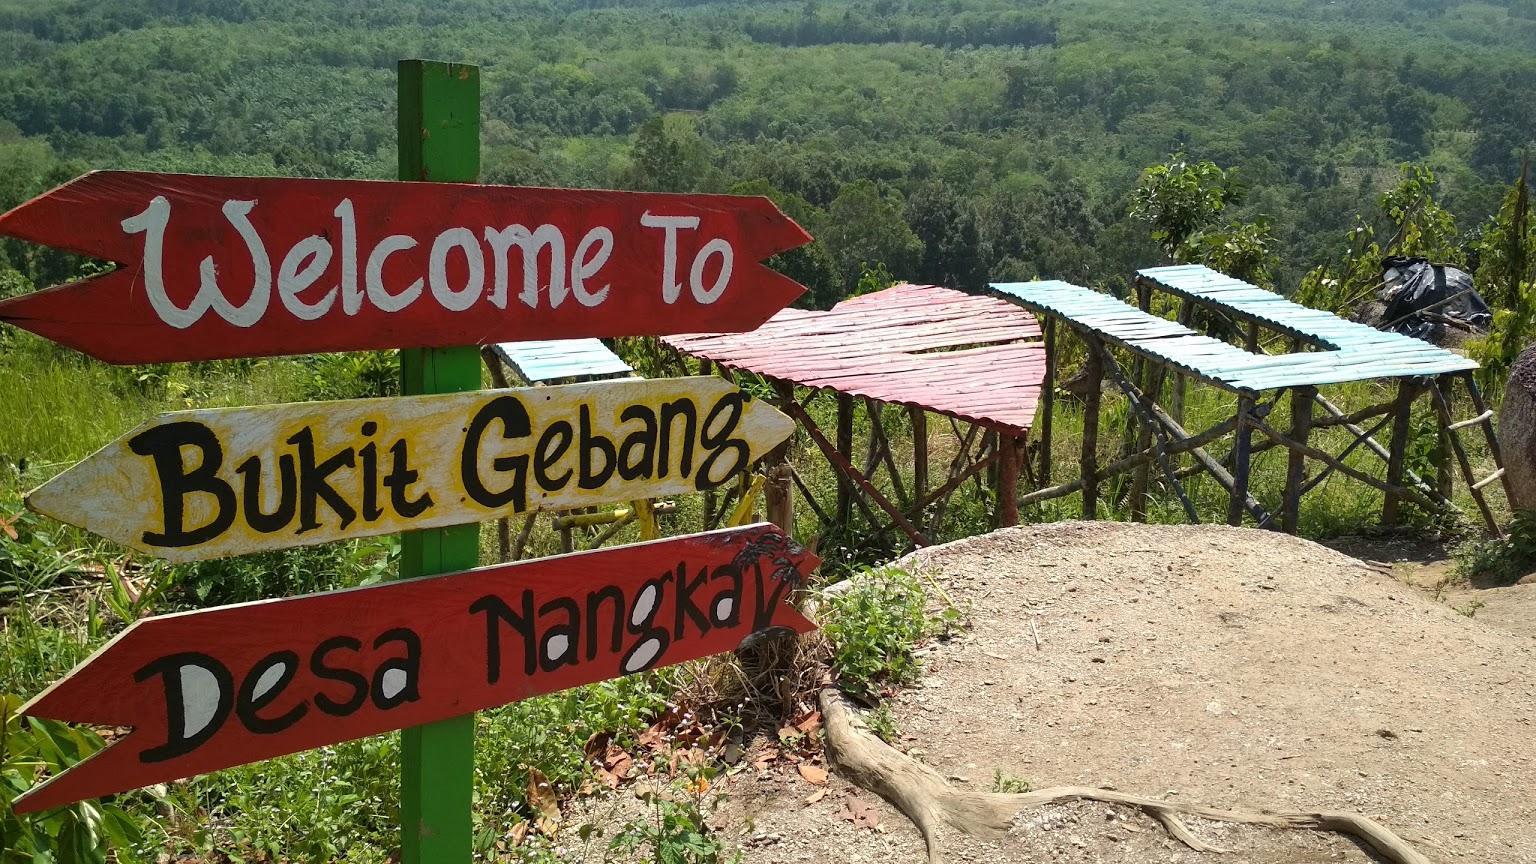 Bukit Gebang Desa Nangka